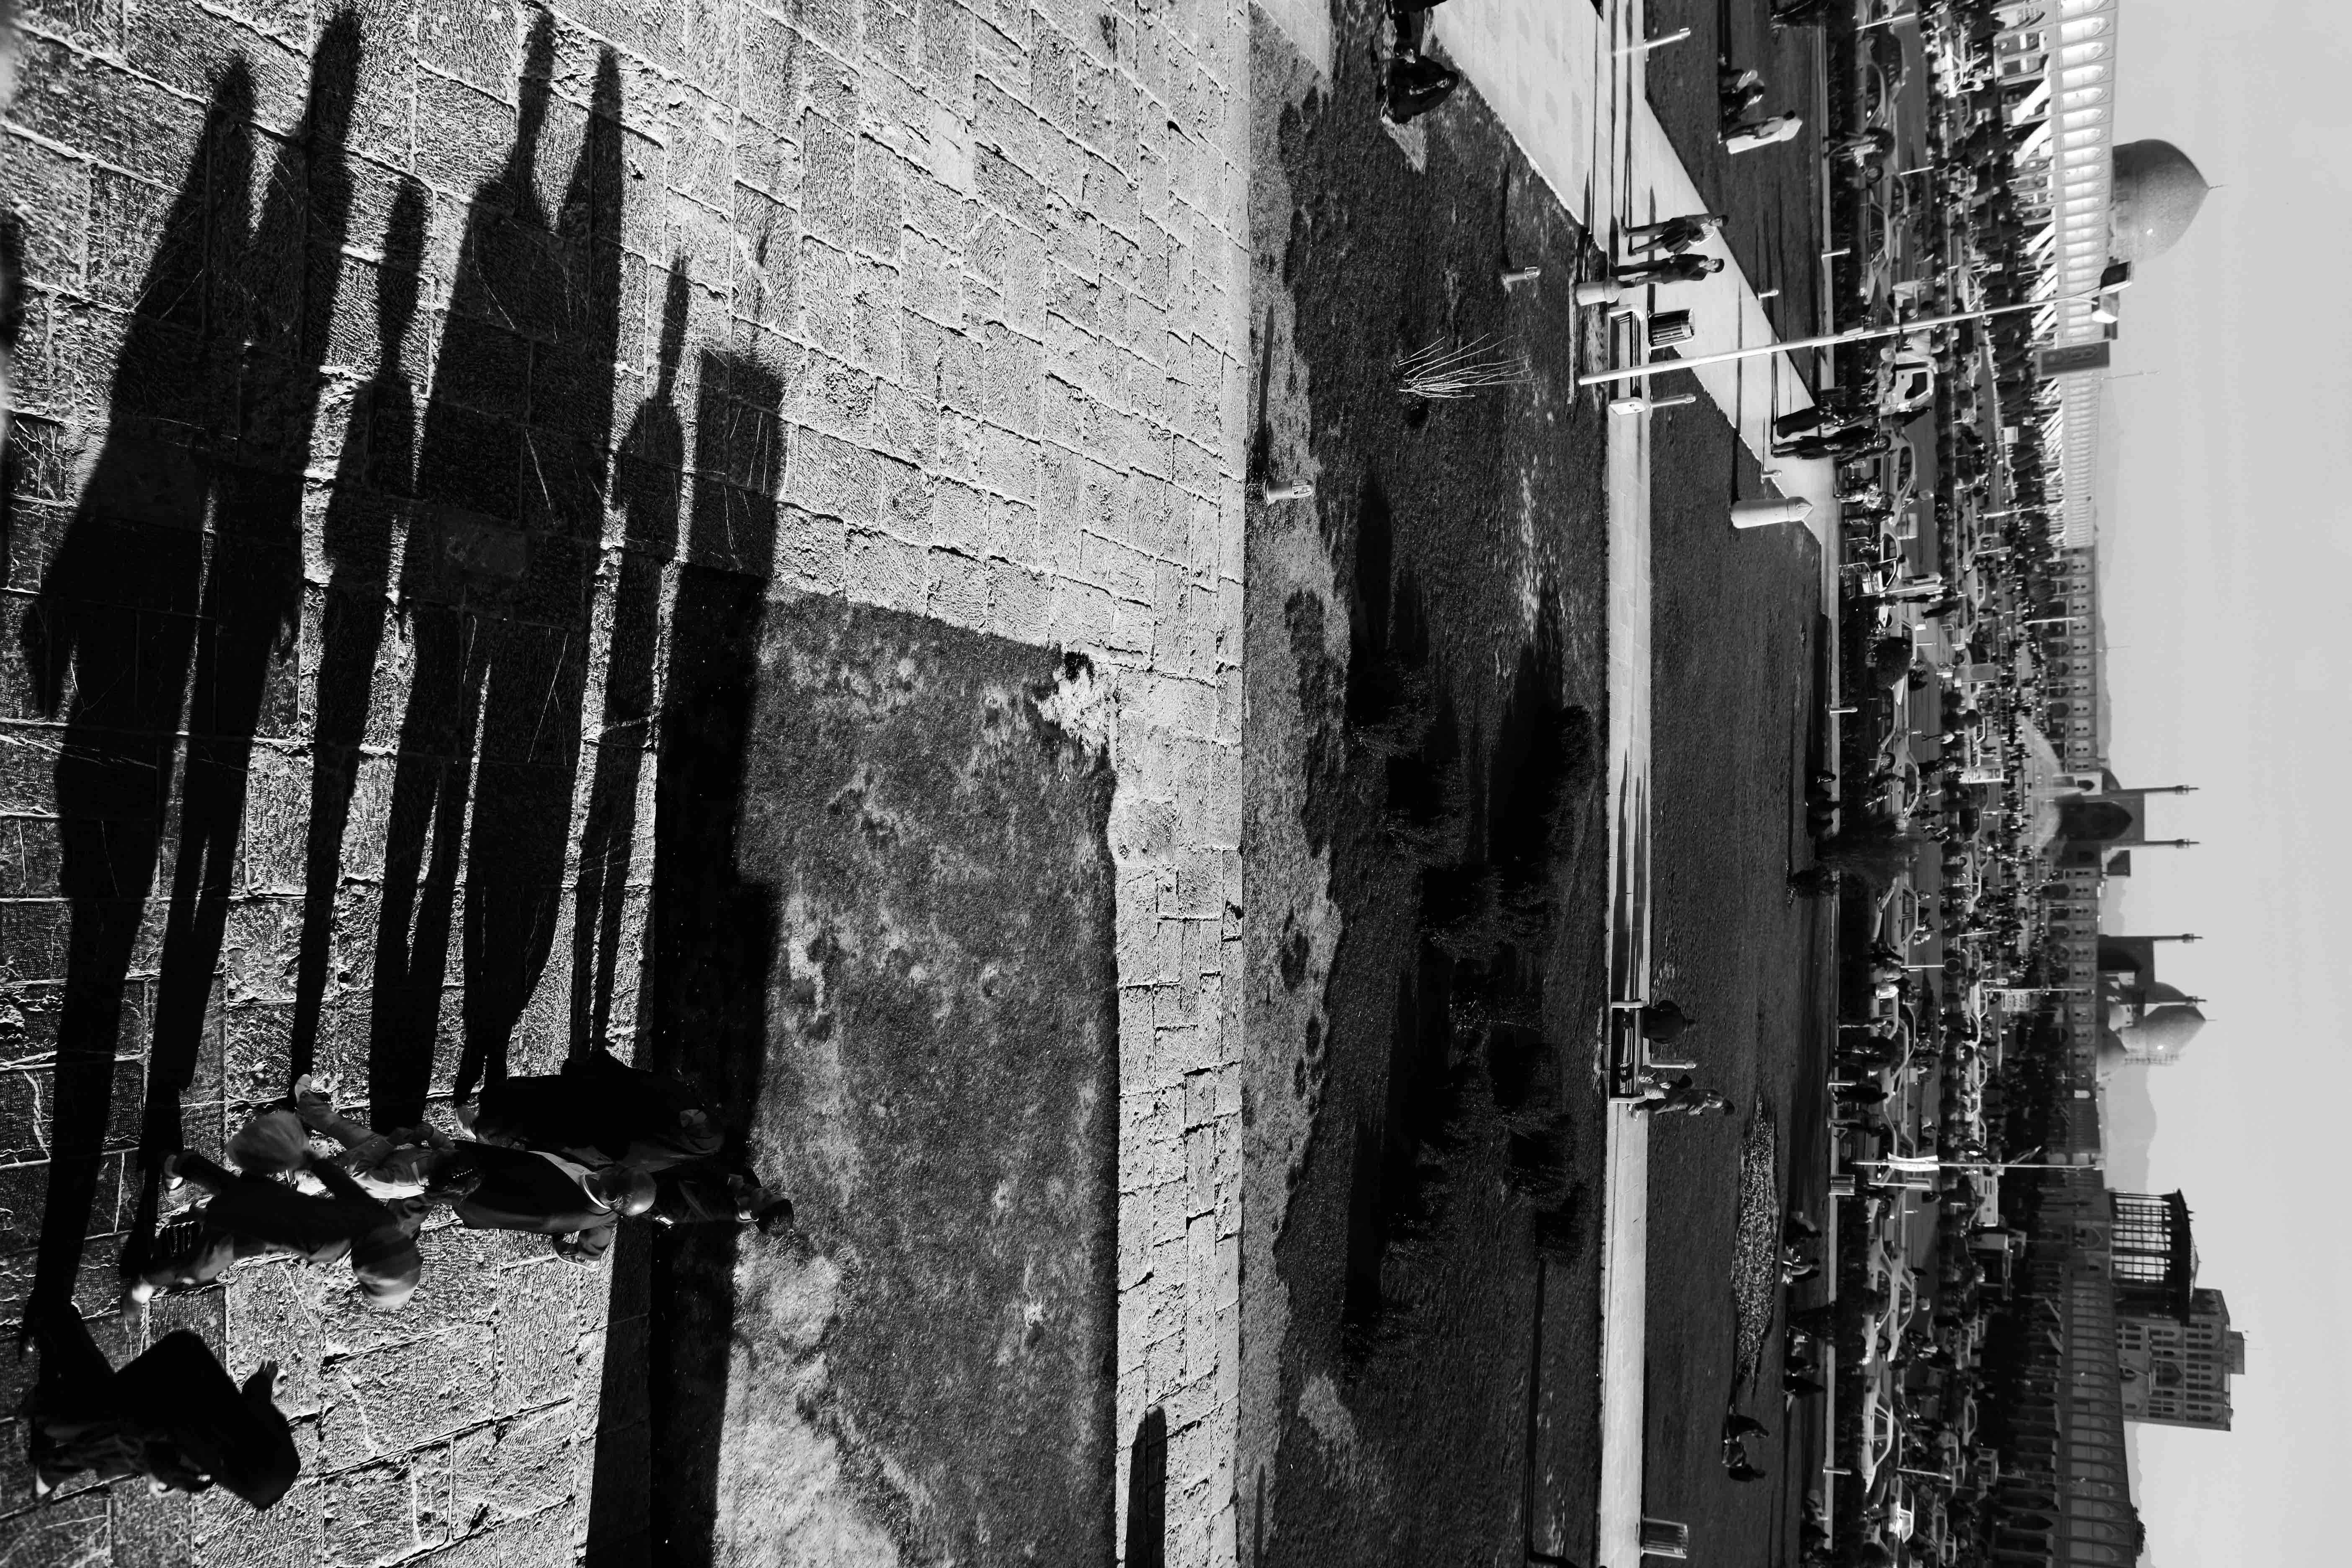 Untitled (2)_ The Life Of Shadows Series - Nehdaran_ Dana